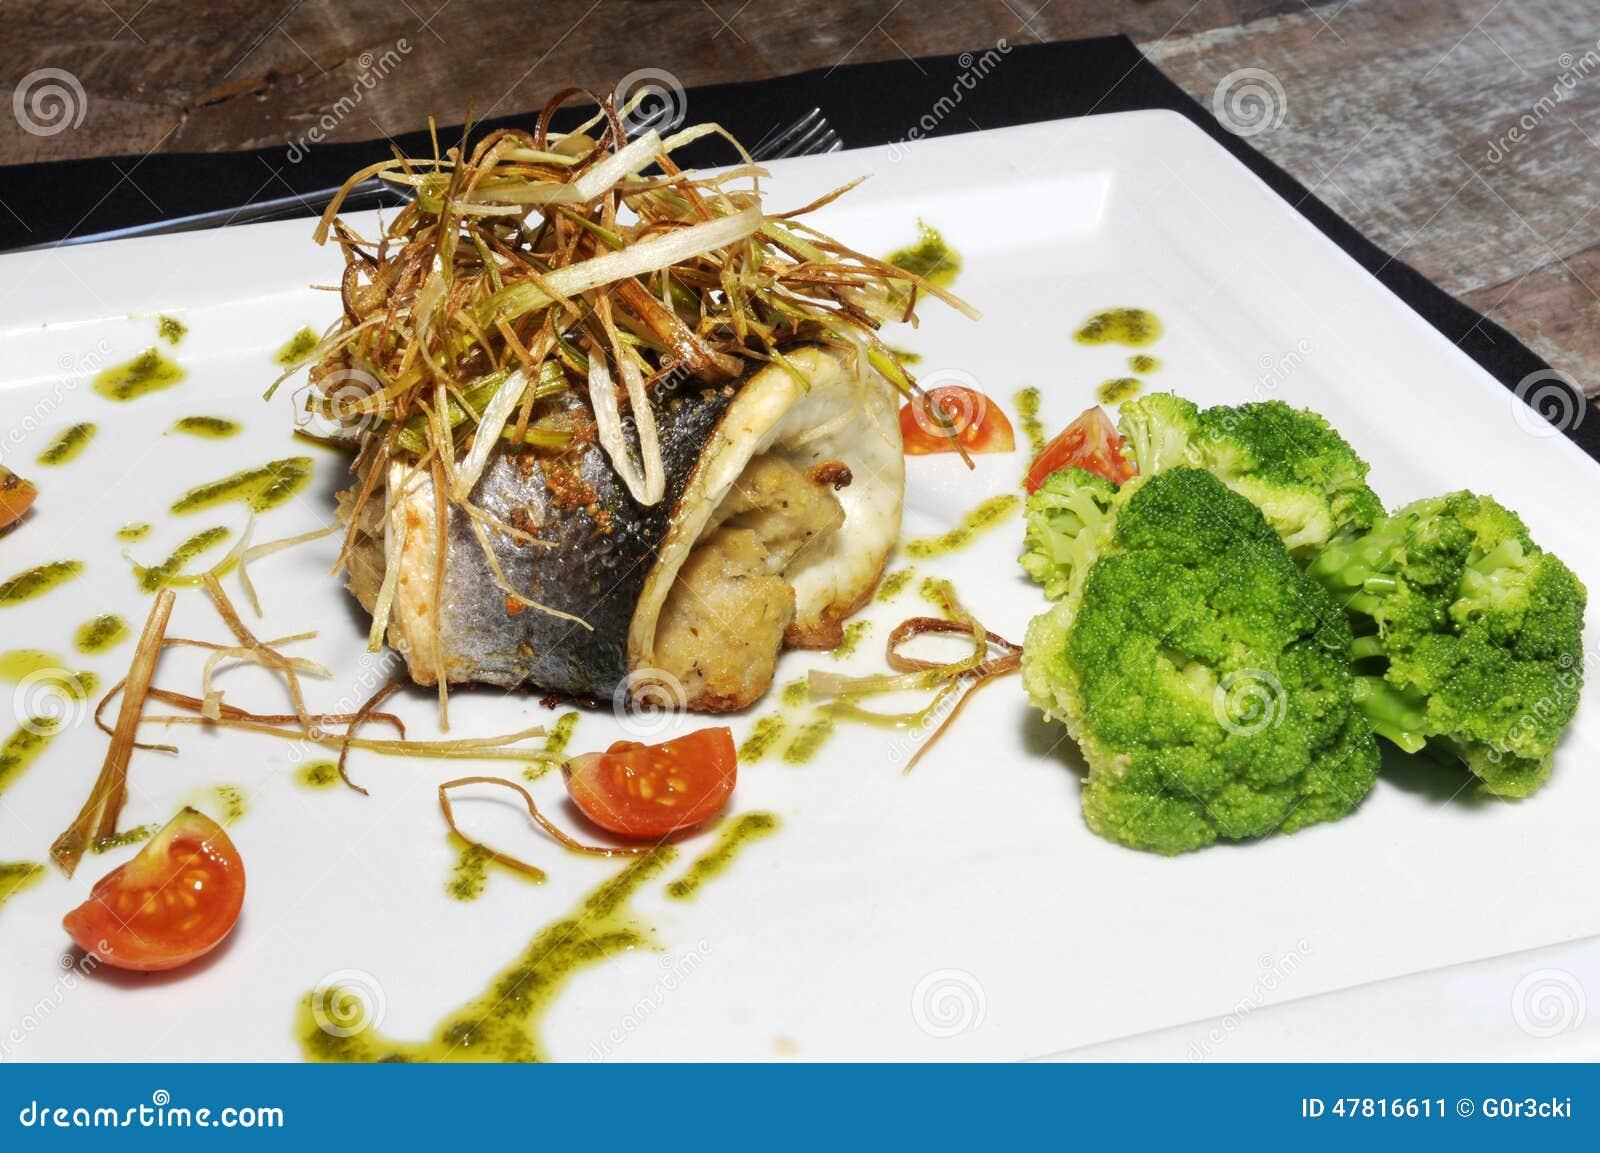 Sea bass fish tomato and broccoli diet food stock photo for Fish and broccoli diet